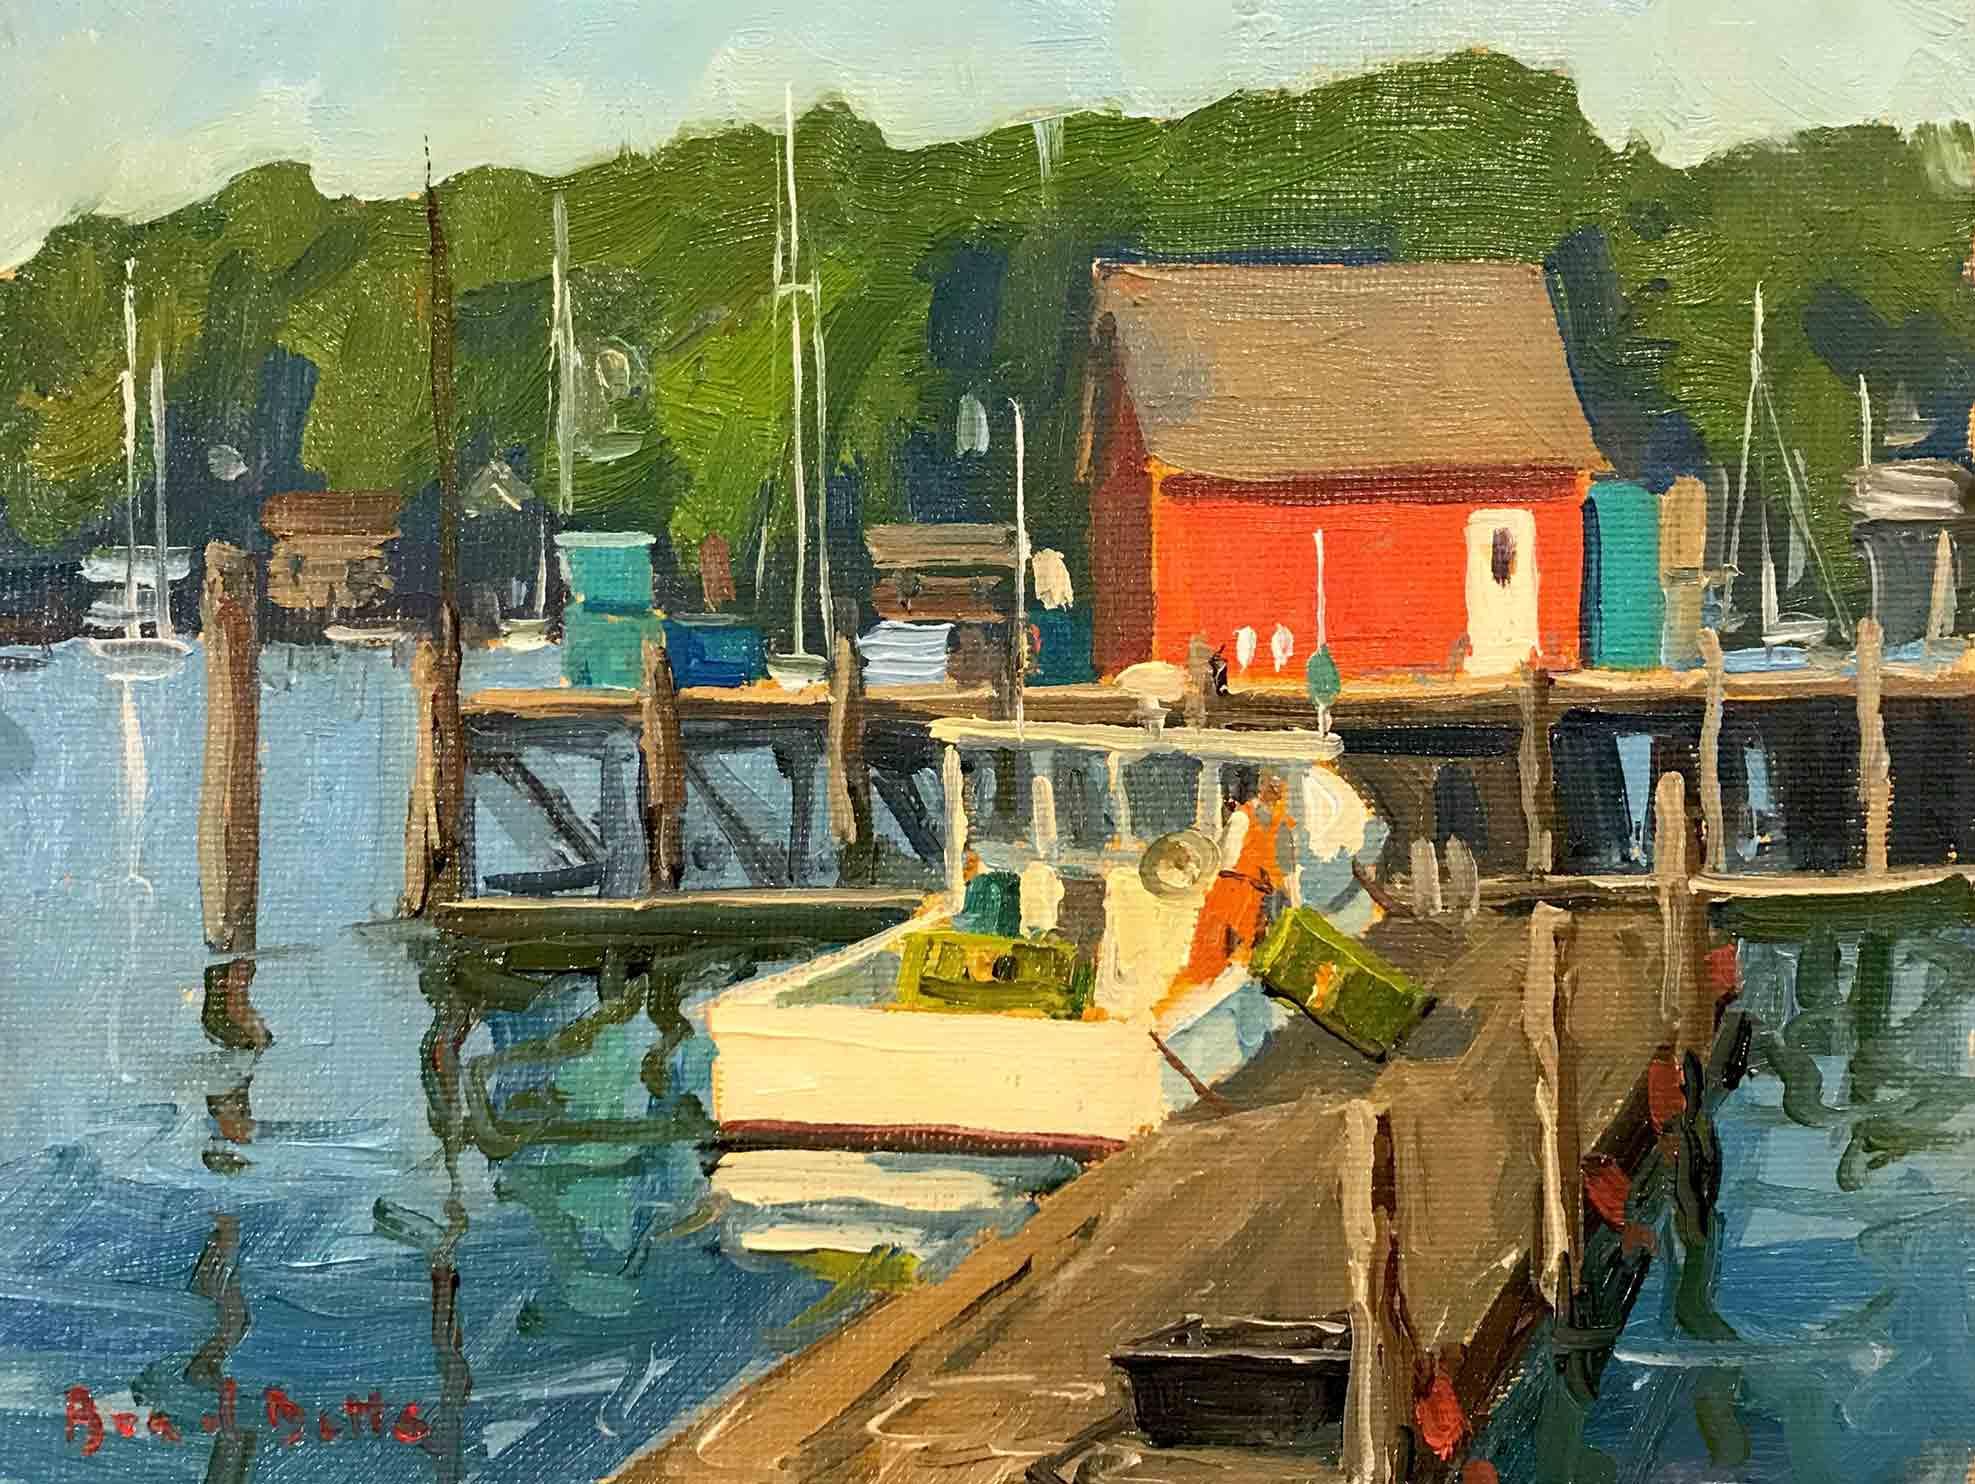 Docked-at-the-Boatshed_web.jpg